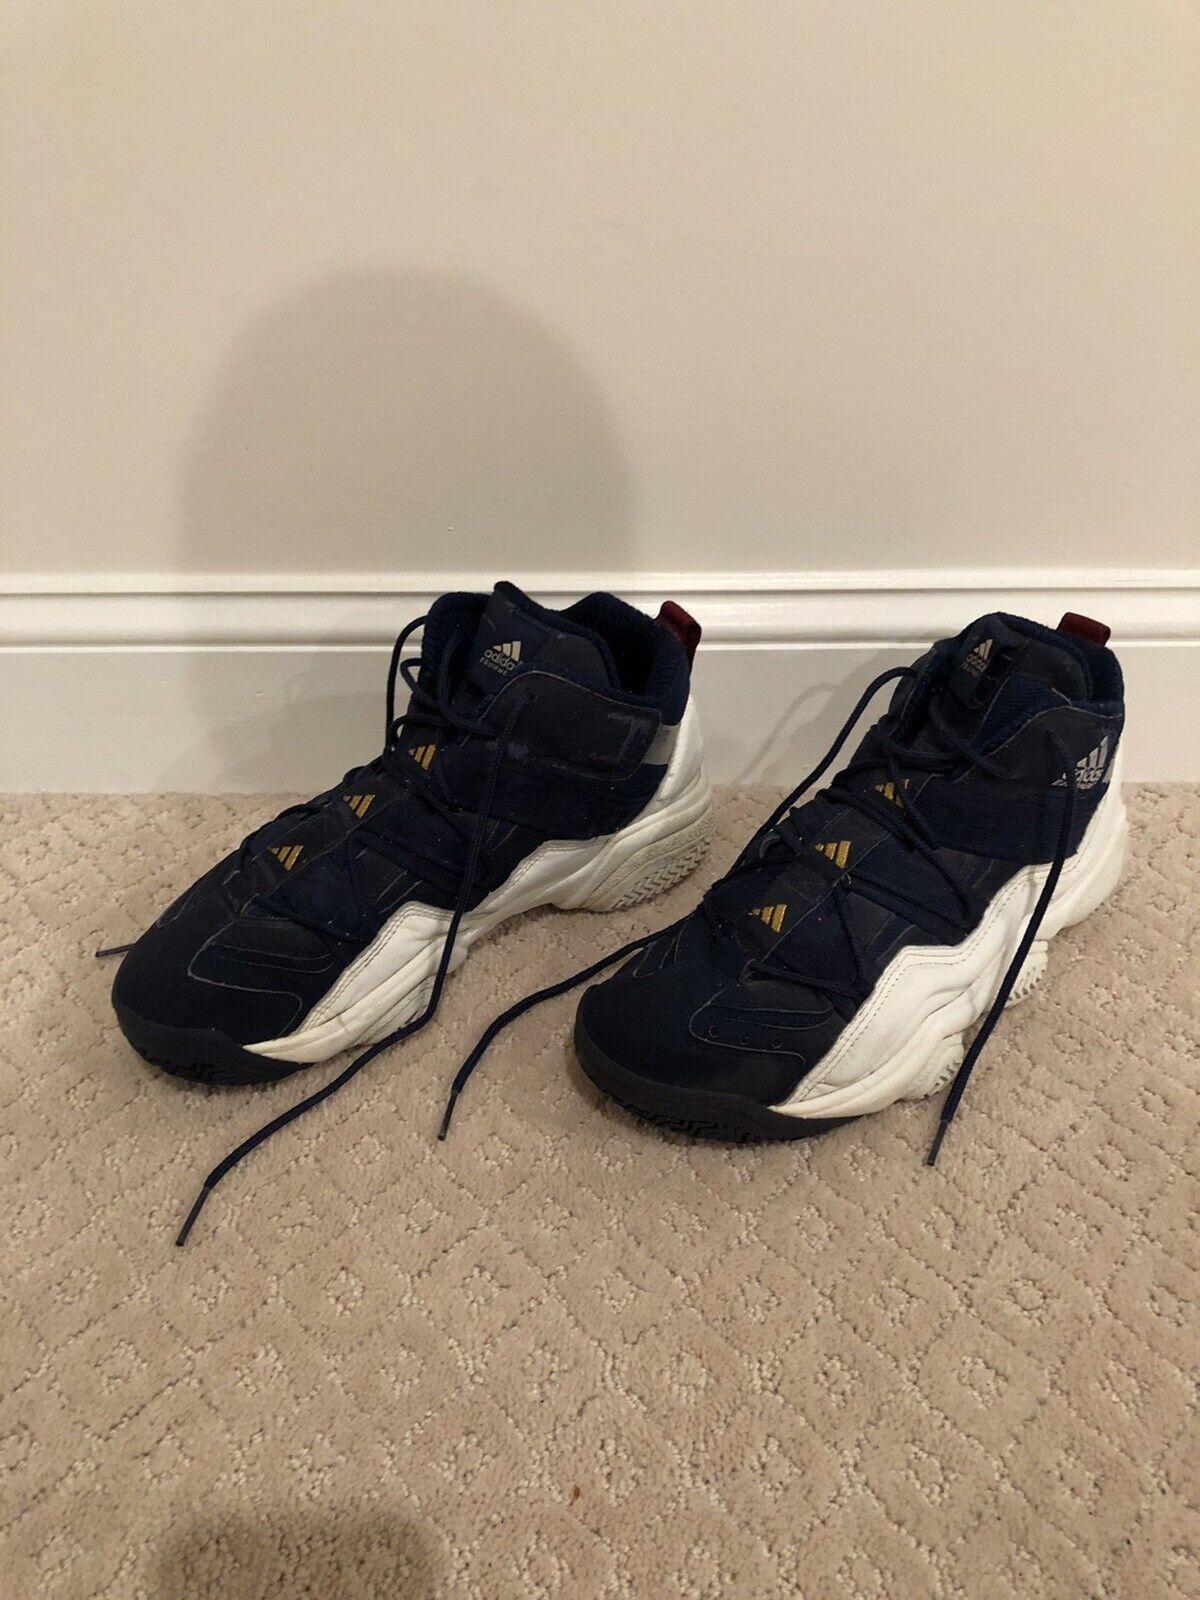 Kobe Bryant Adidas Sneakers. - image 10